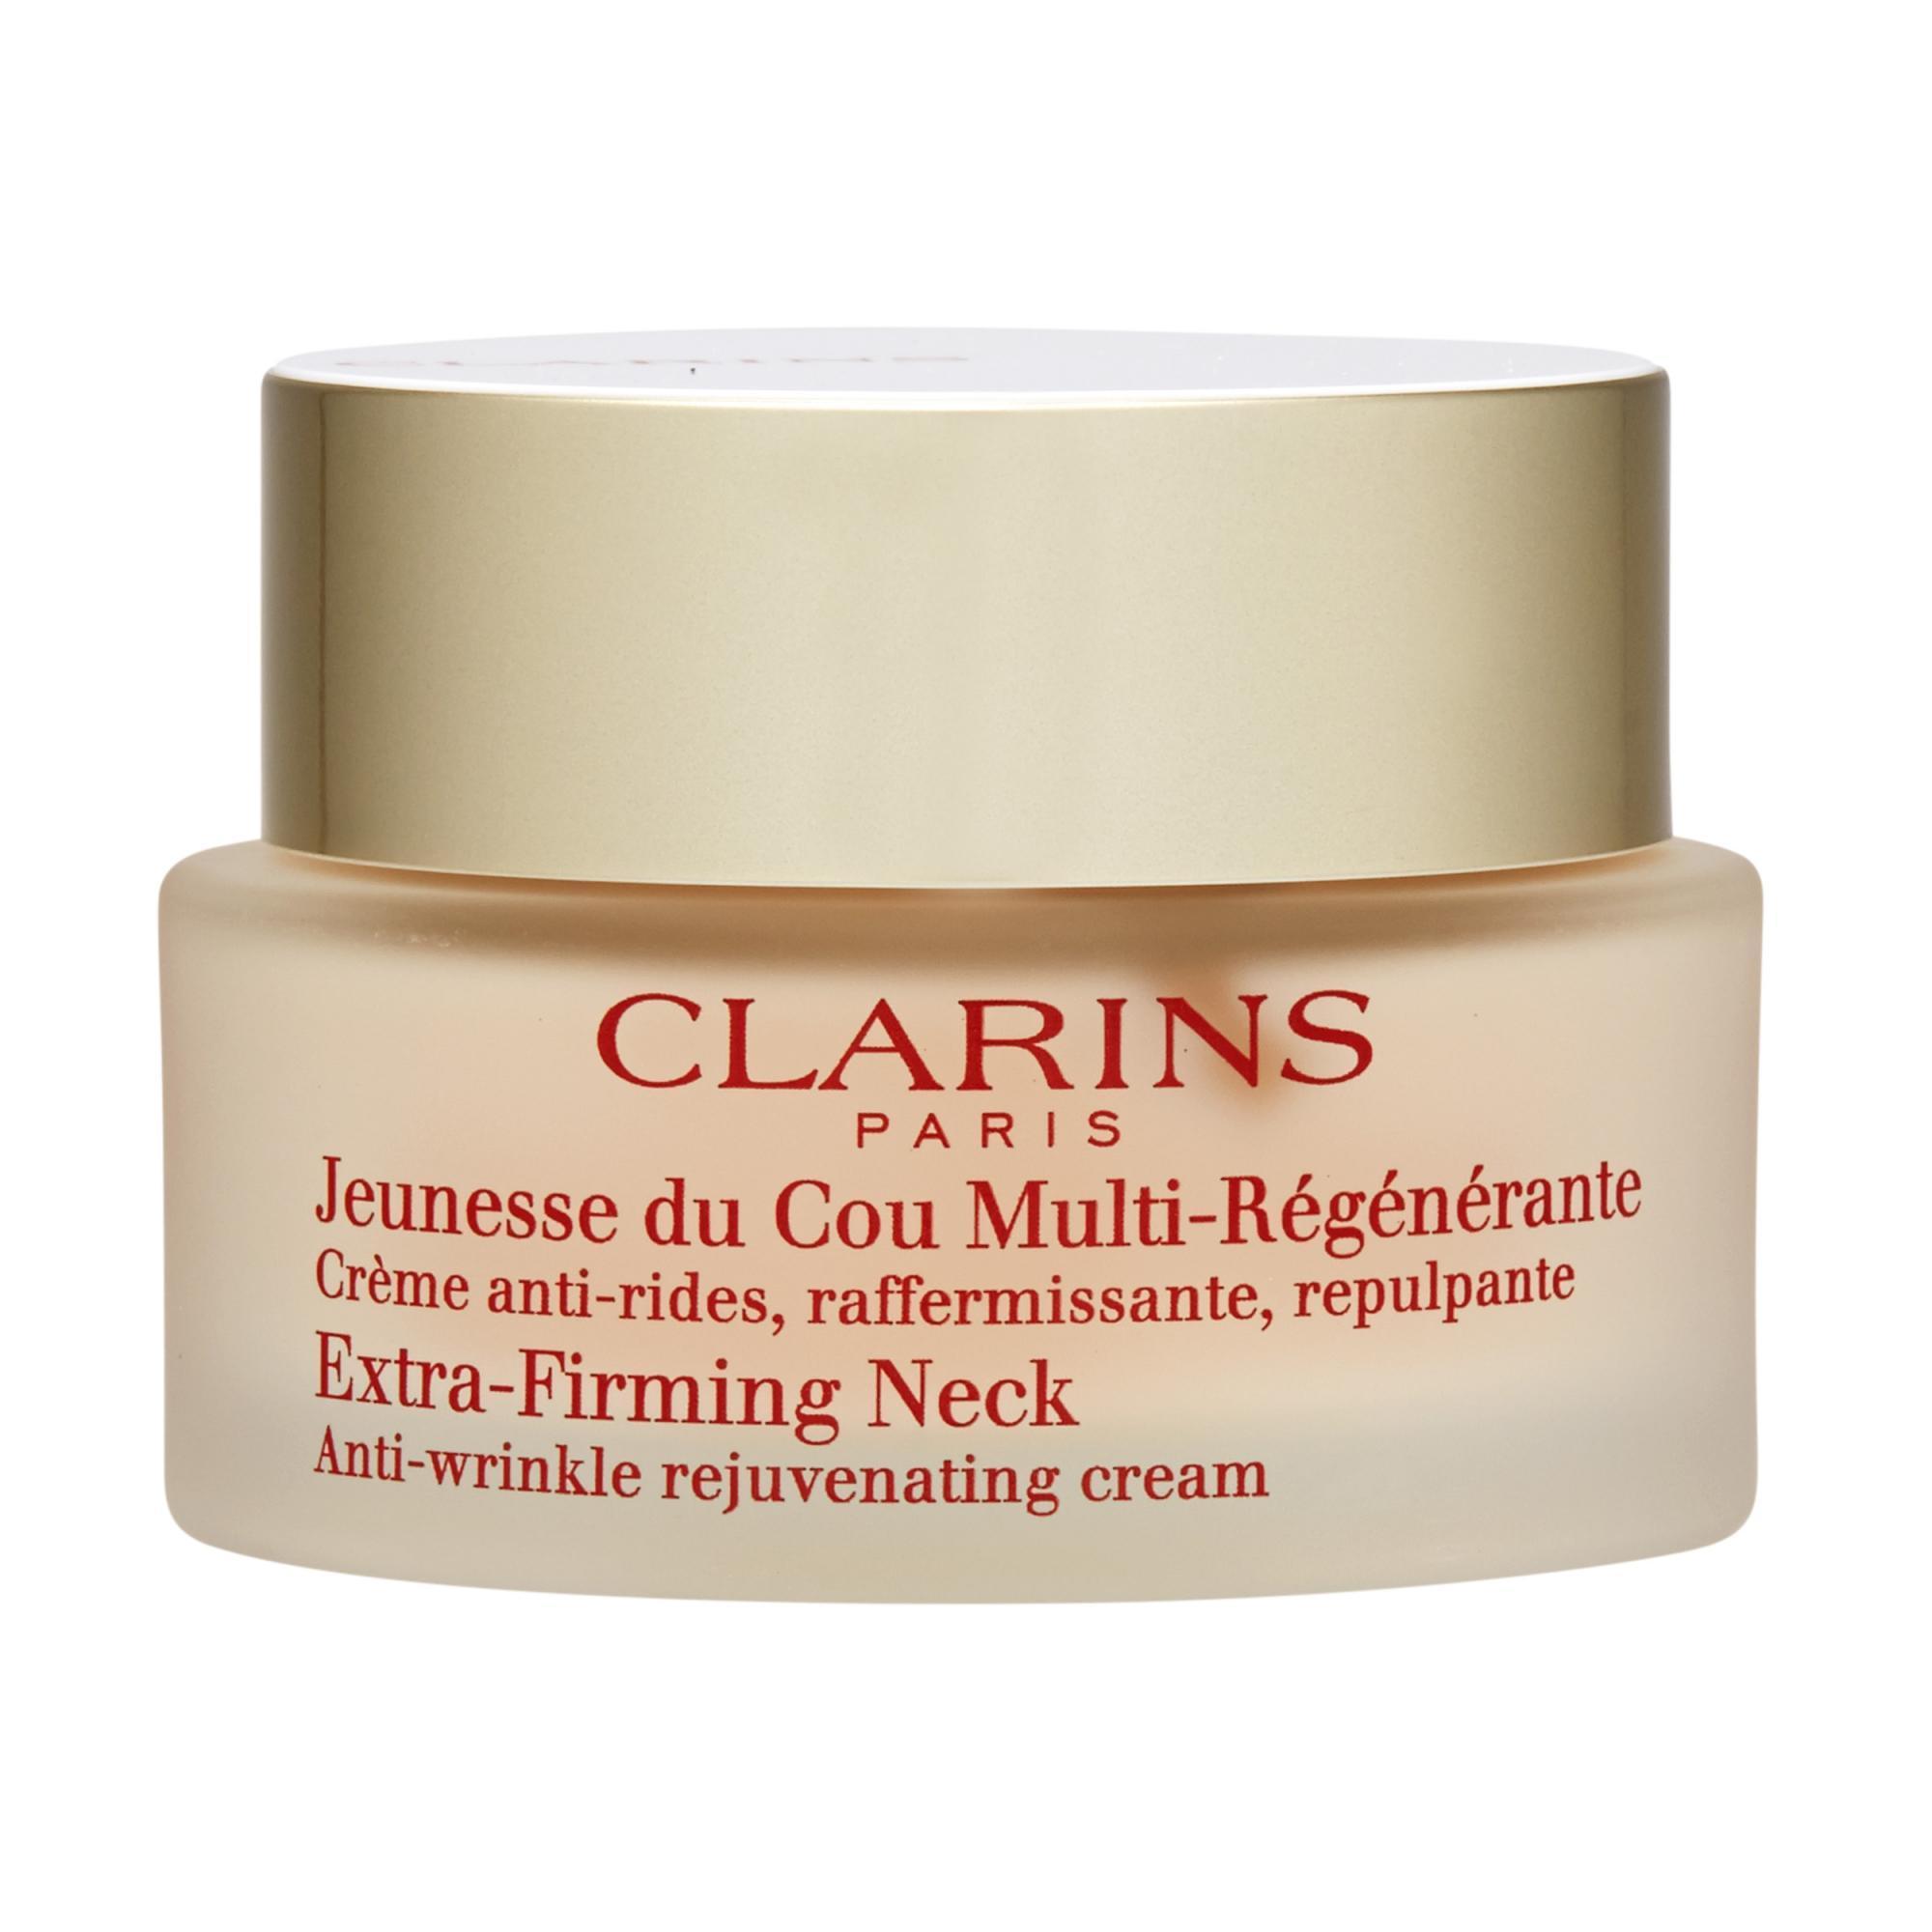 Promo Clarins Extra Firming Neck Anti Wrinkle Rejuvenating Cream 50Ml 1 6Oz Intl